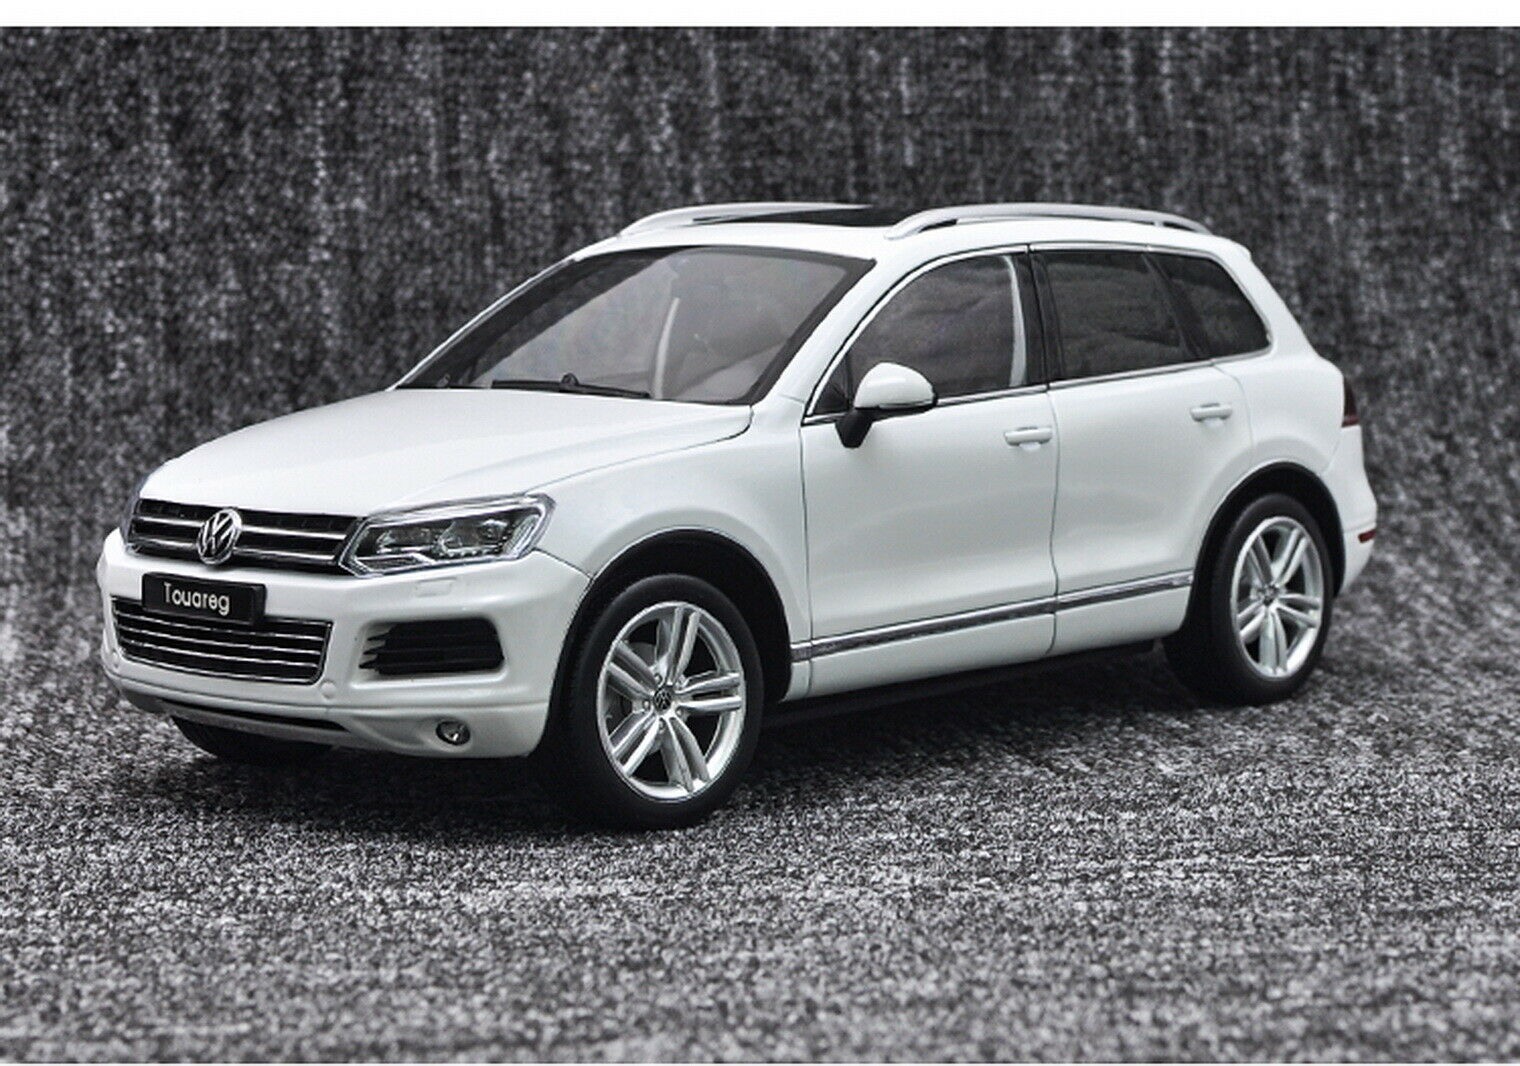 1 18 Scale VW Volkswagen Touareg SUV bianca Diecast Car Model Toy GT Autos